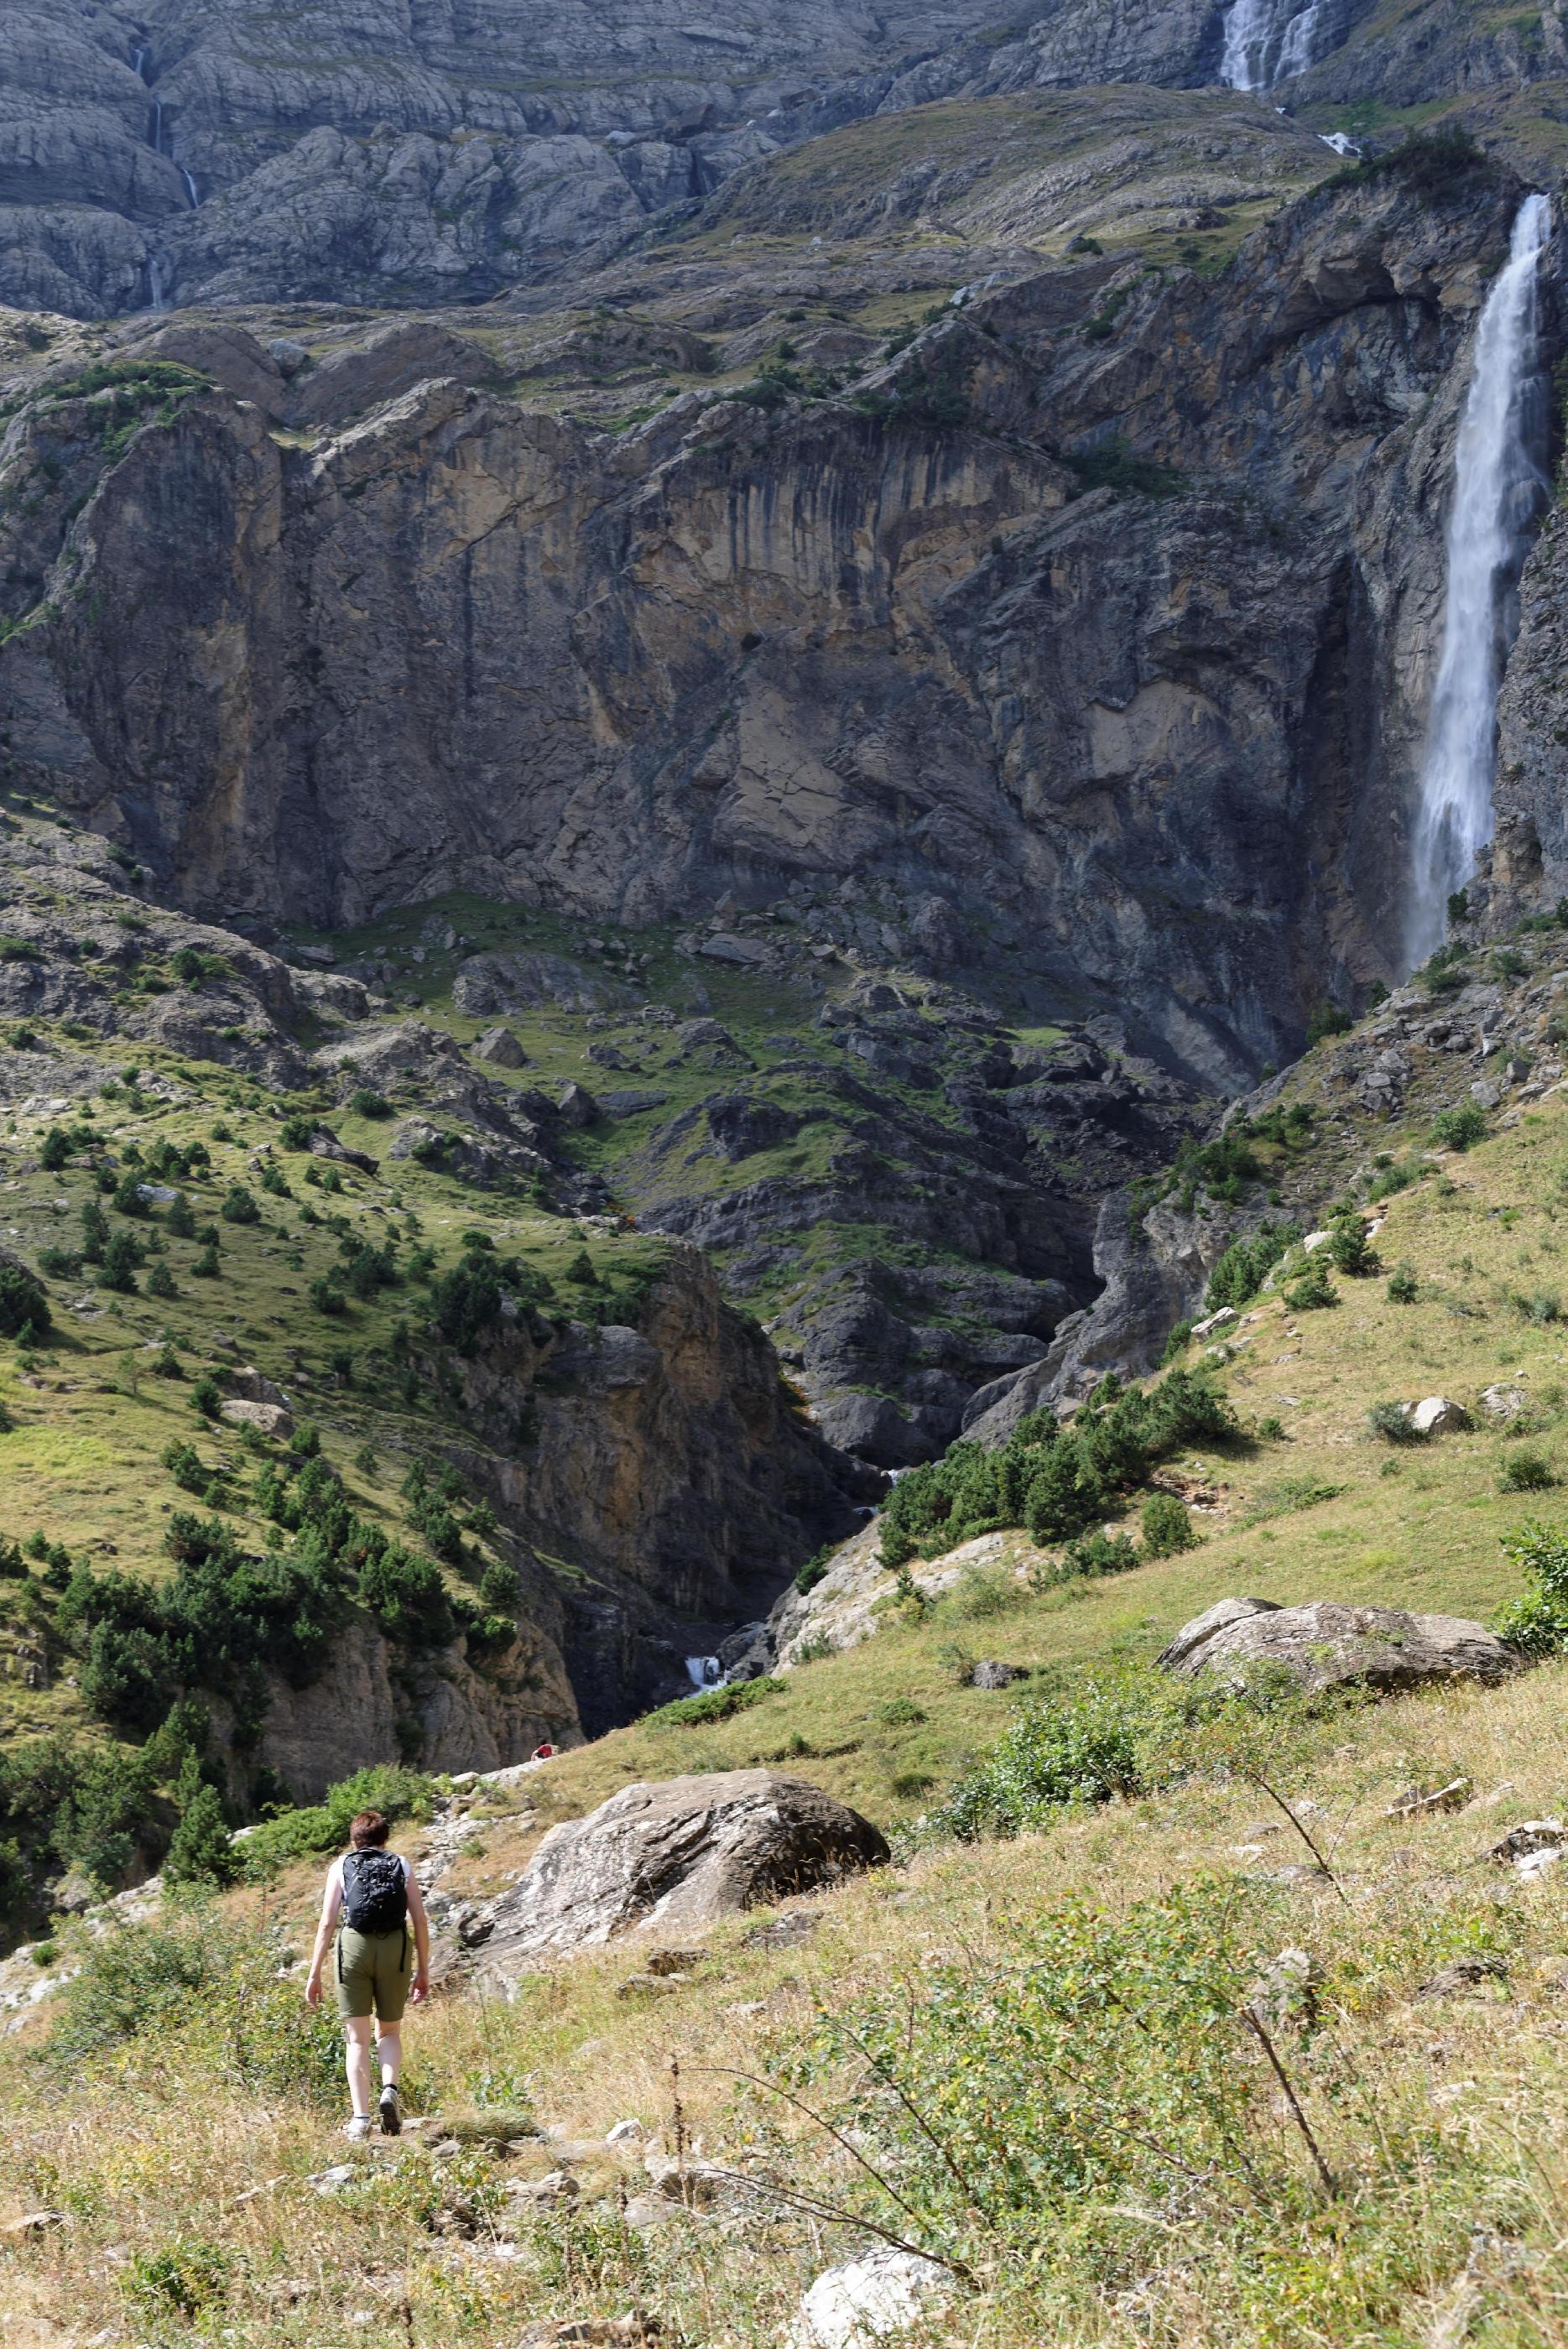 160910-marche-cascade-du-cinca-et-de-la-larri-sobrarbe-aragon-126